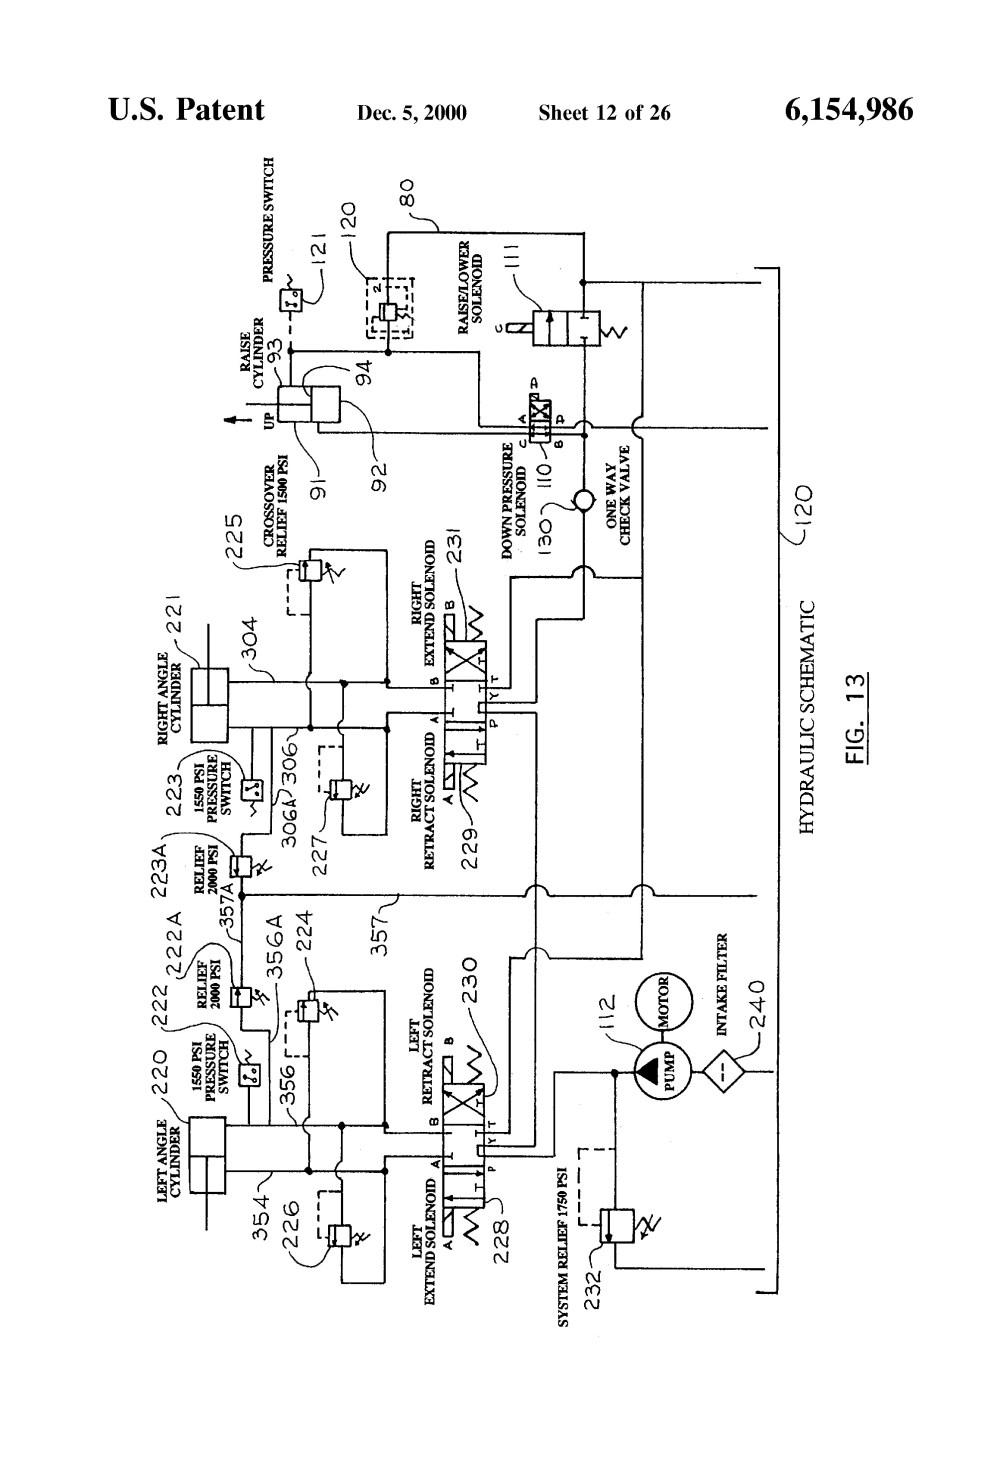 medium resolution of western plow controller wiring diagram for 2970 16 wiring diagramwestern snow plow diagram wiring diagram western